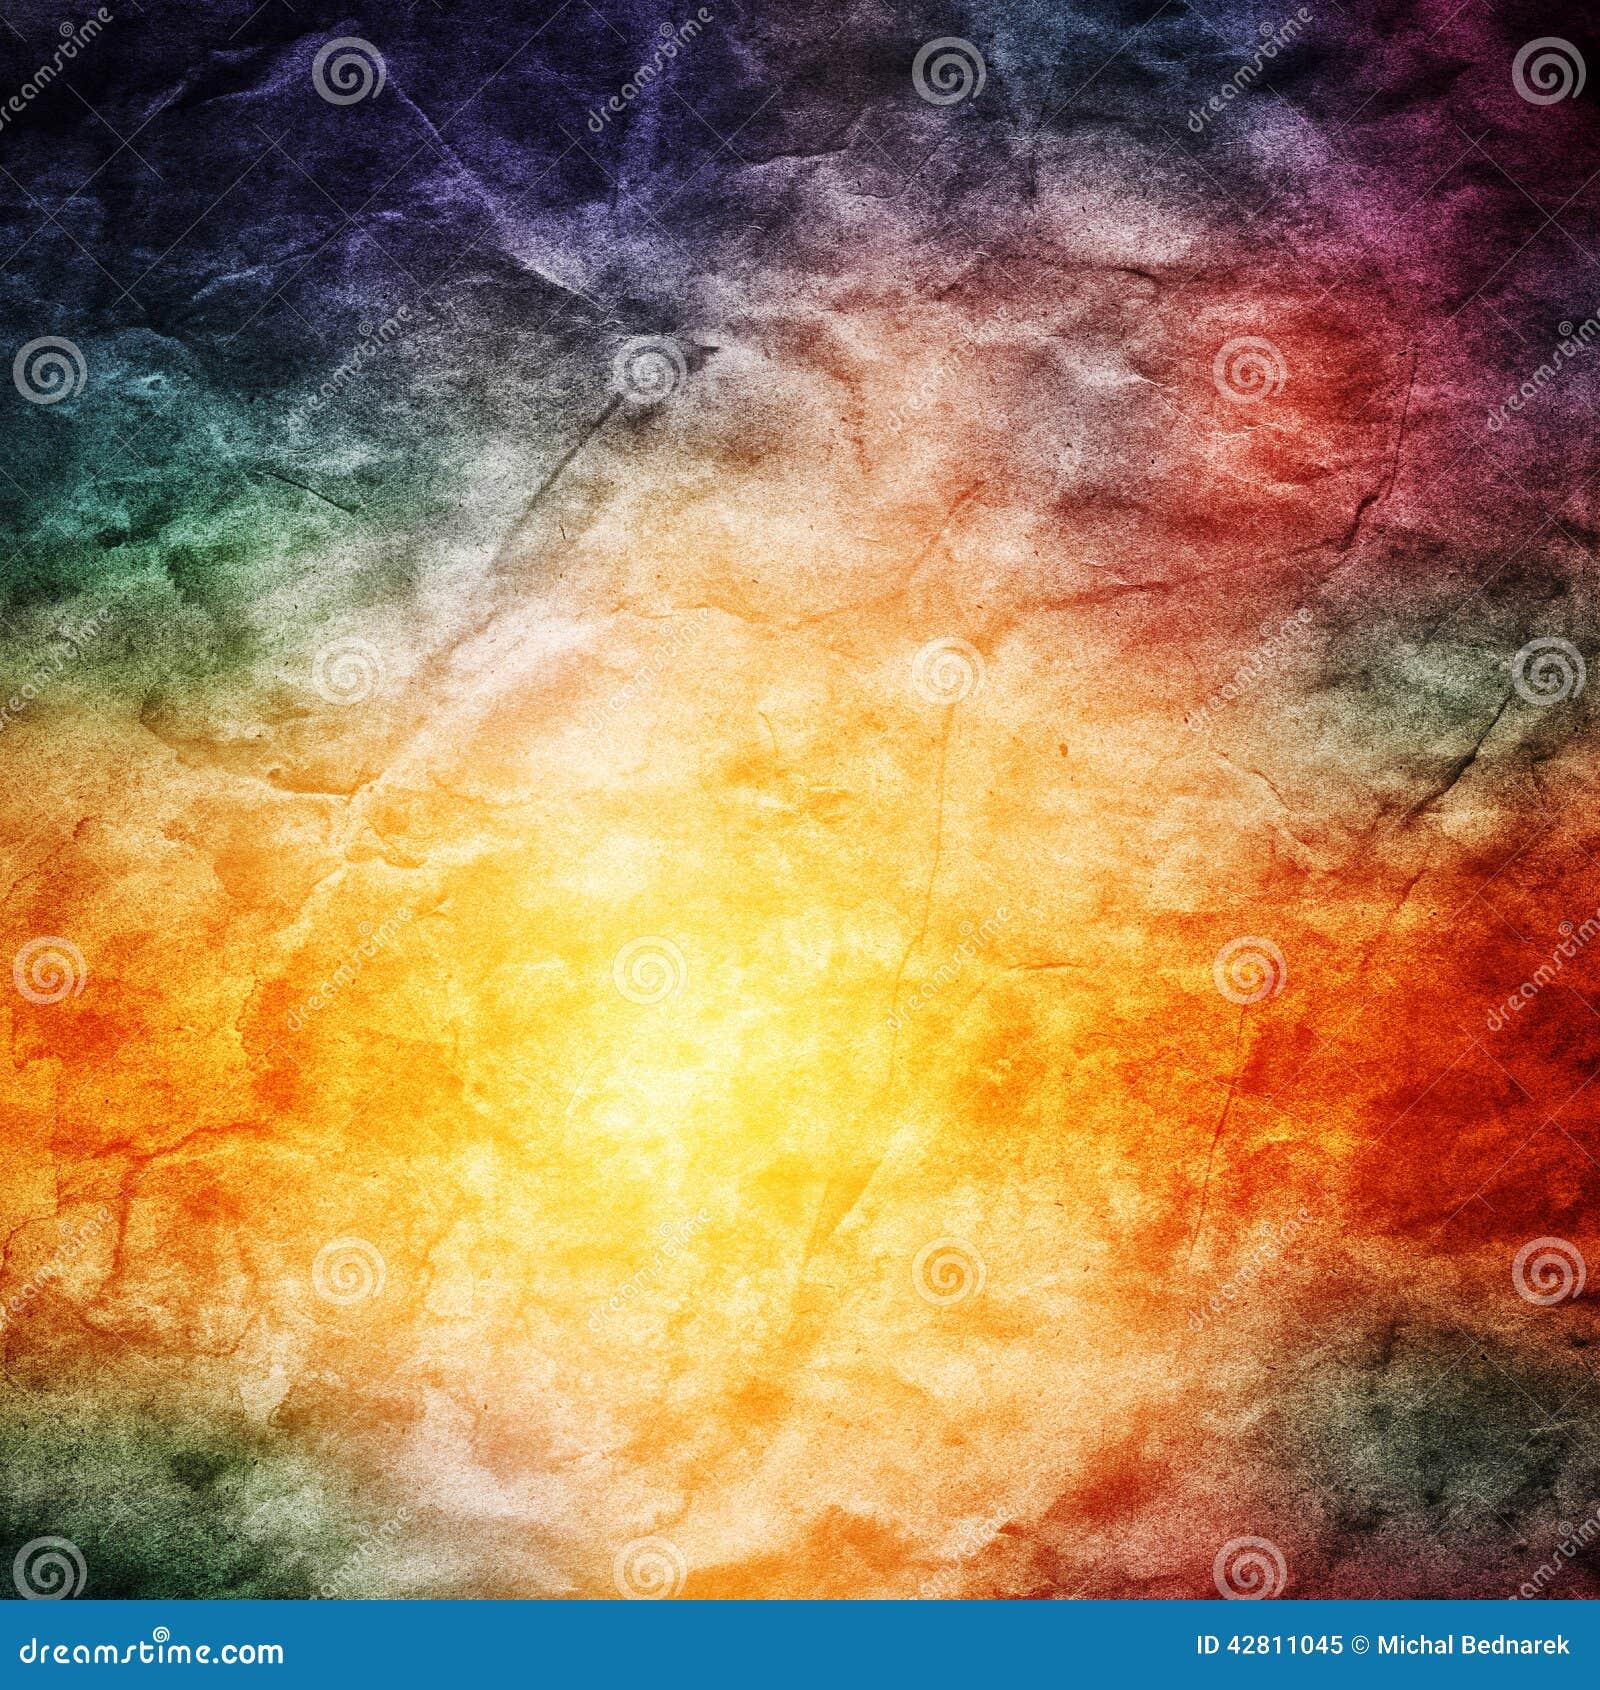 Винтажная красочная предпосылка природы Текстура Grunge ретро, hd